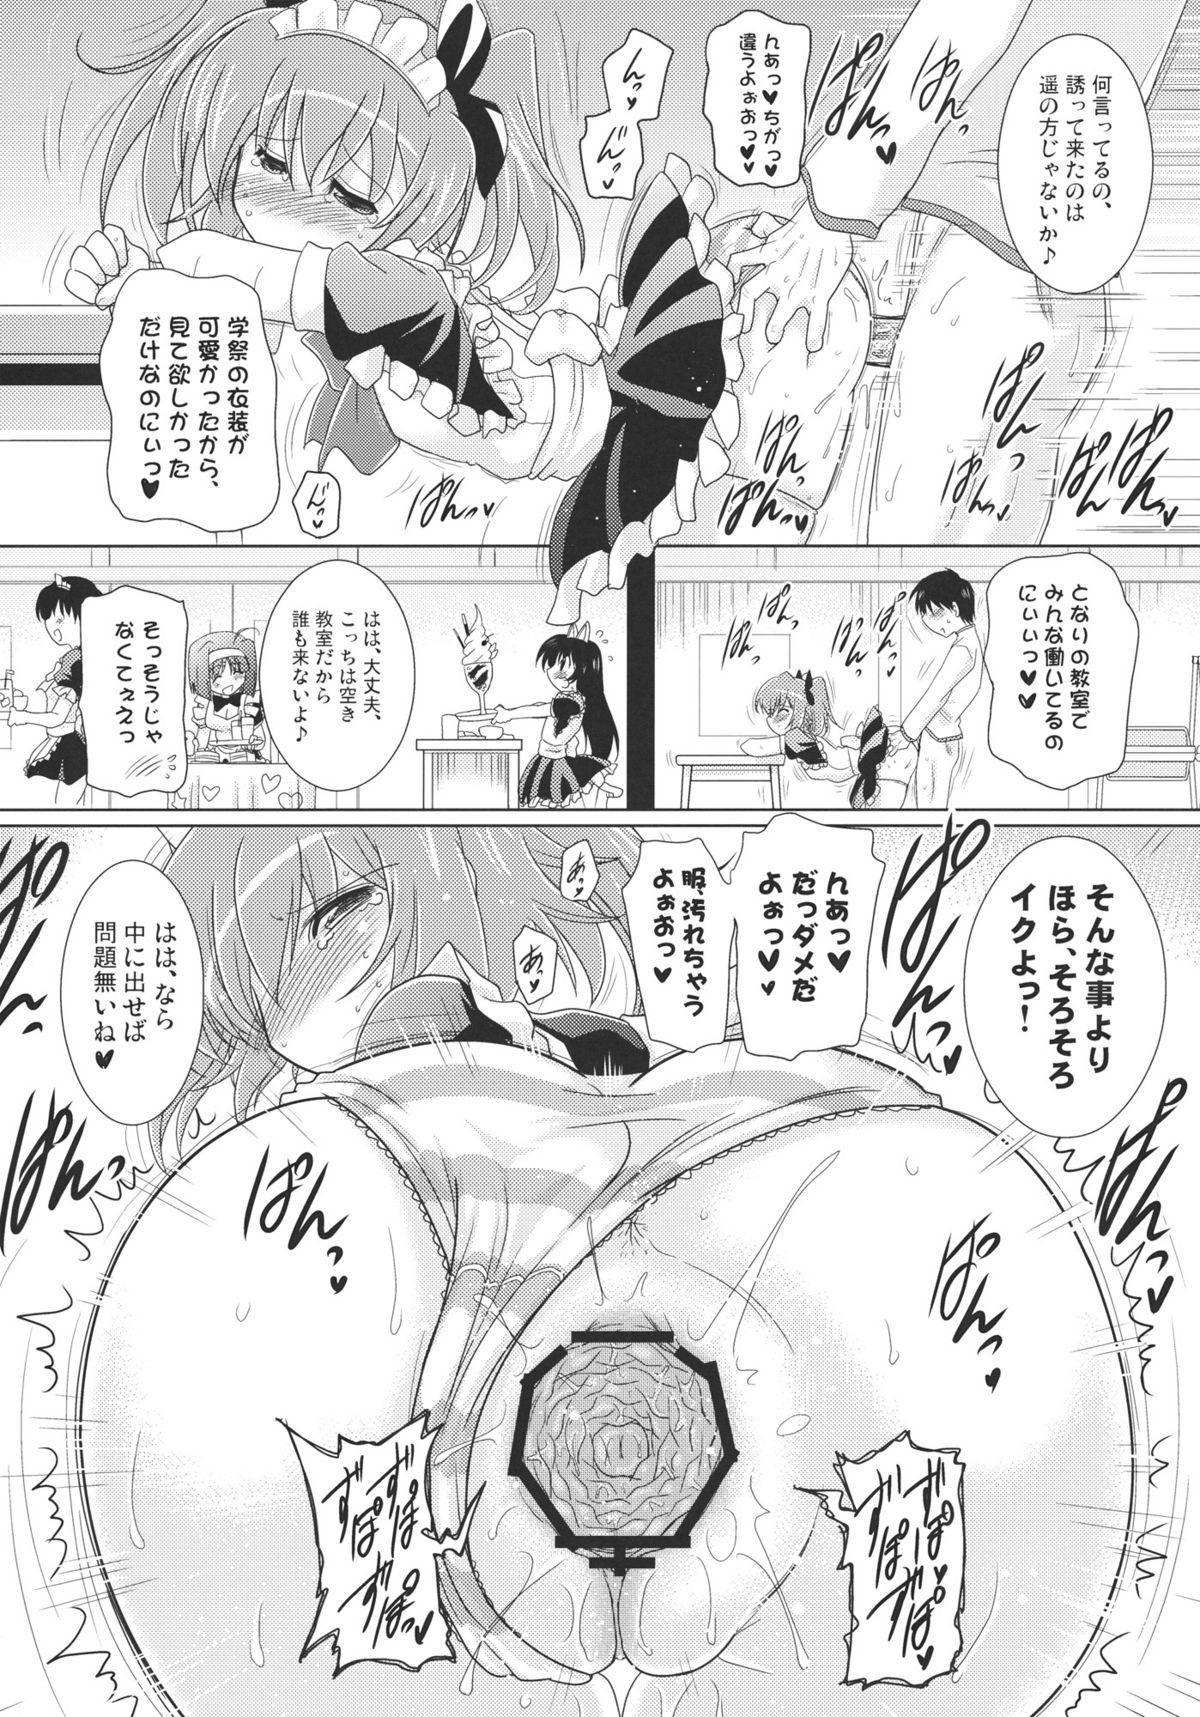 Kozukuri Angel Kyunpara! 4